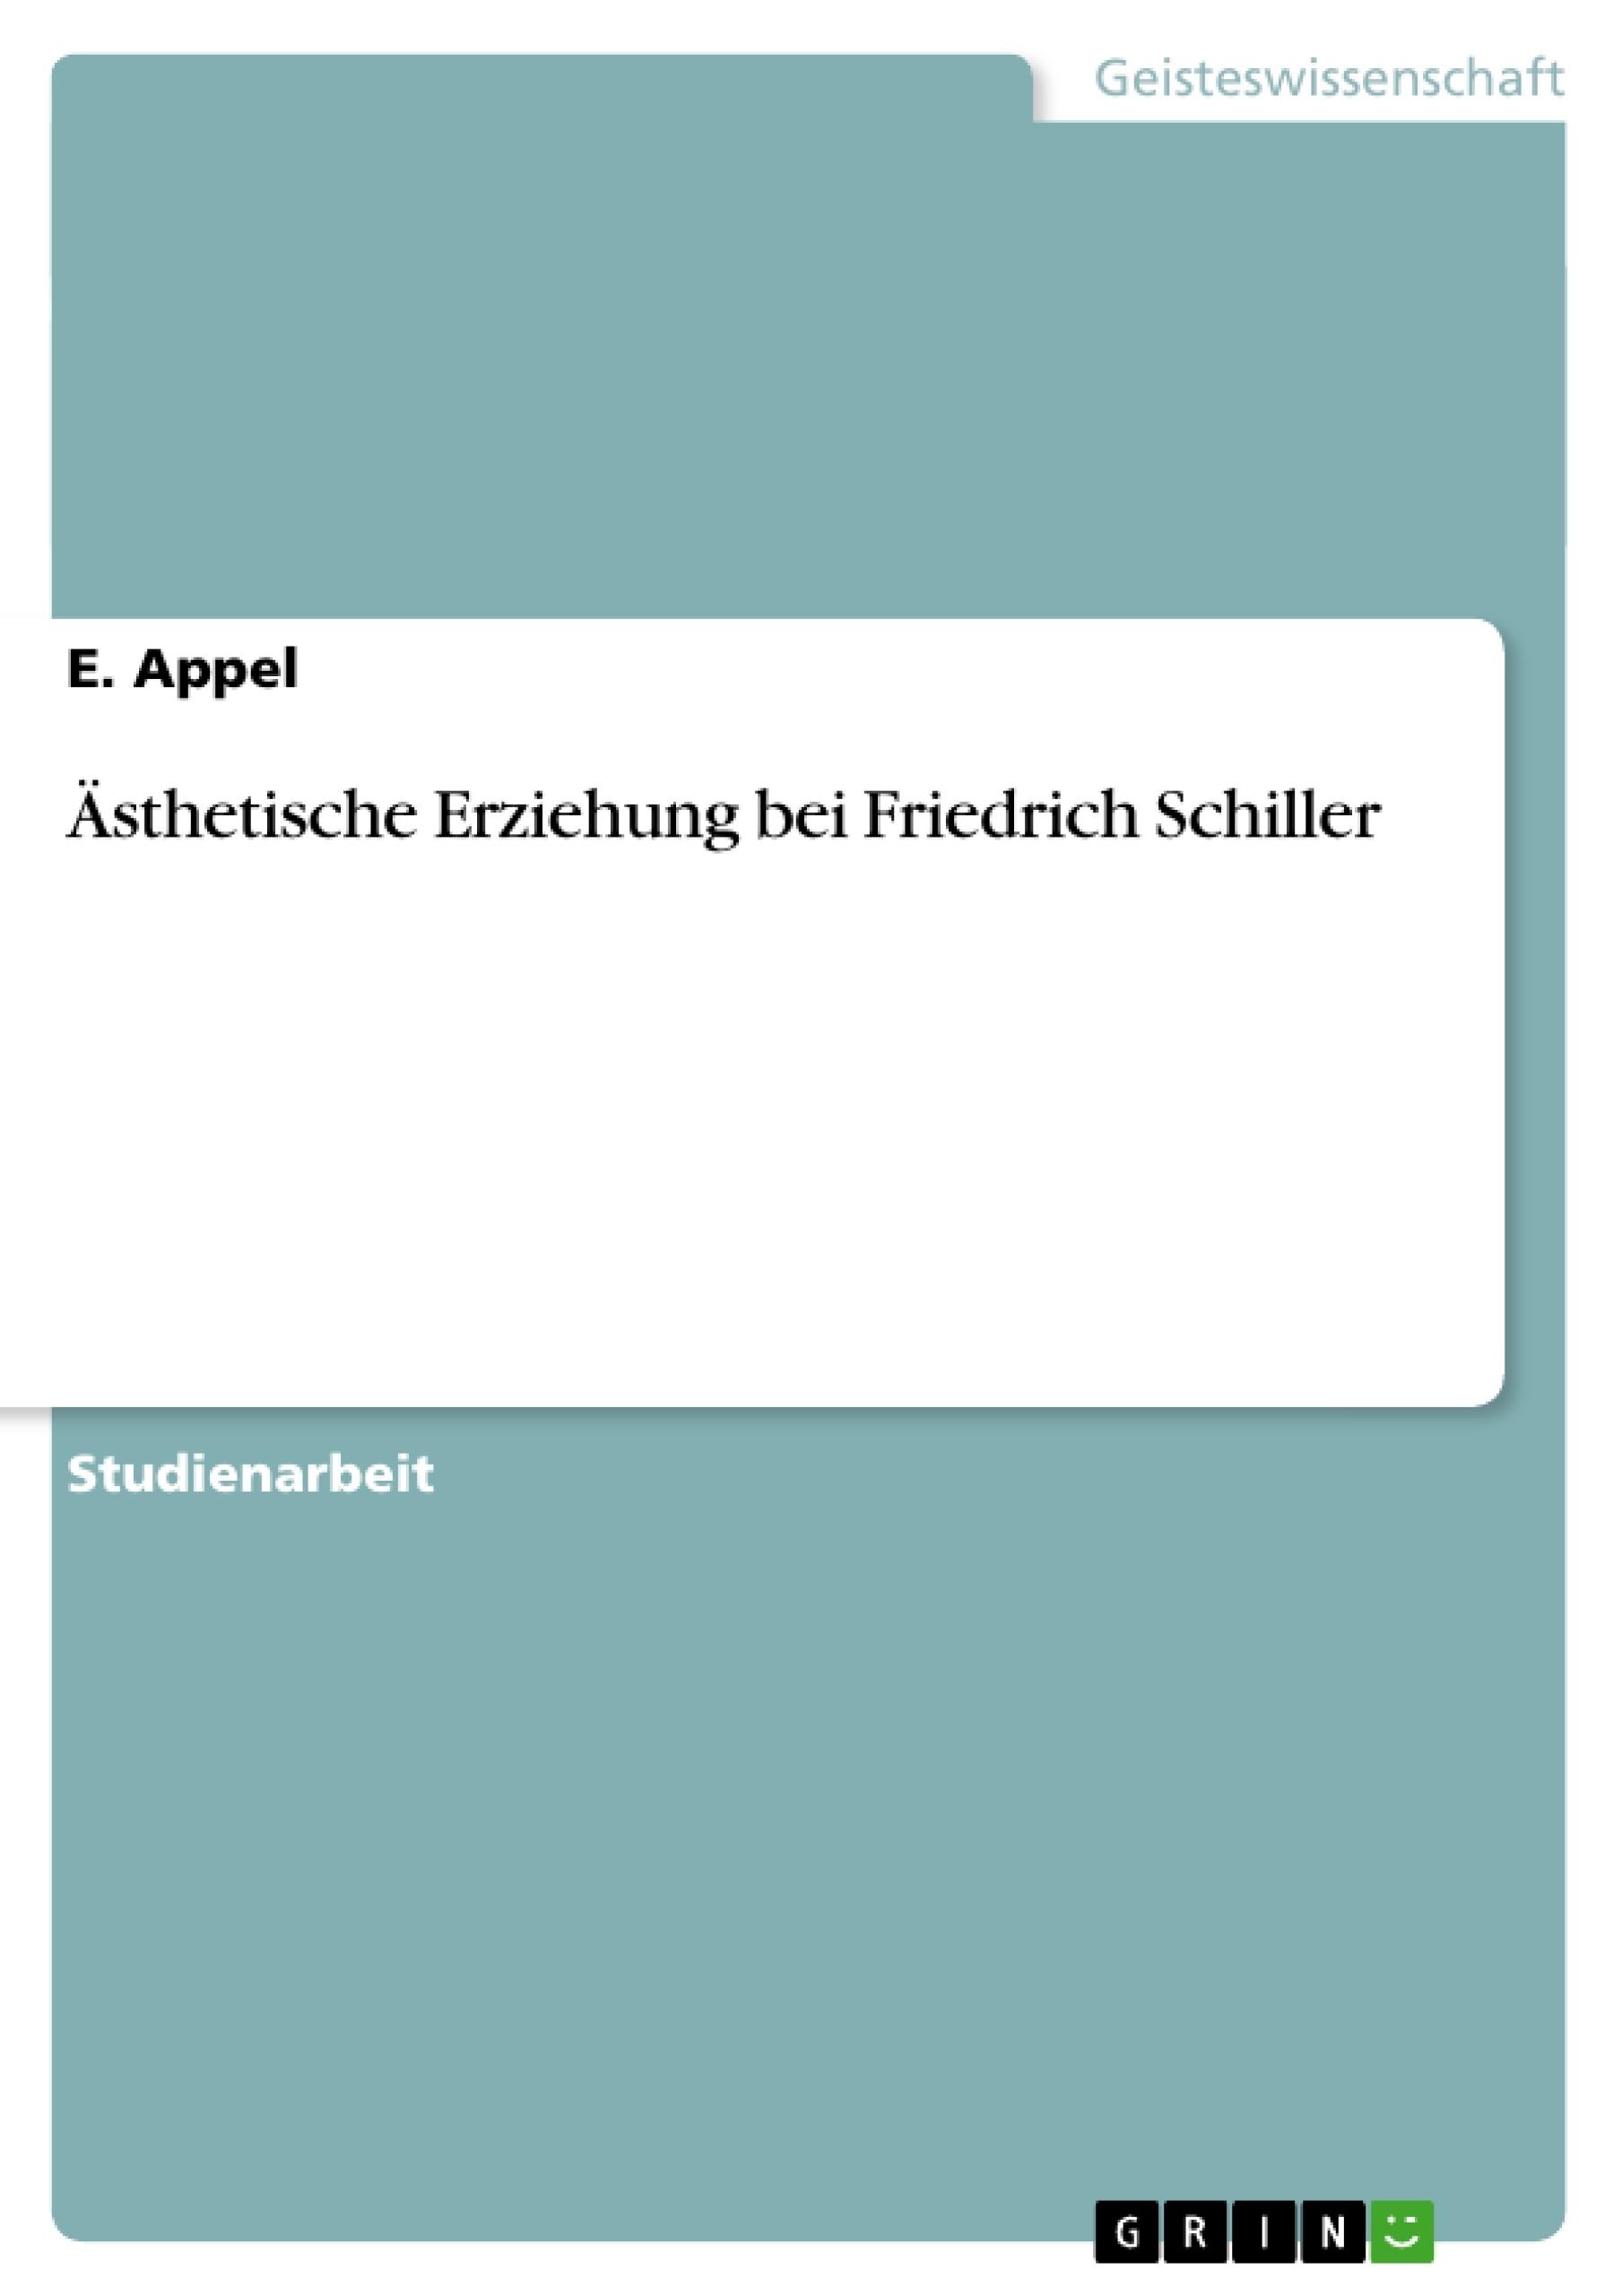 Titel: Ästhetische Erziehung bei Friedrich Schiller